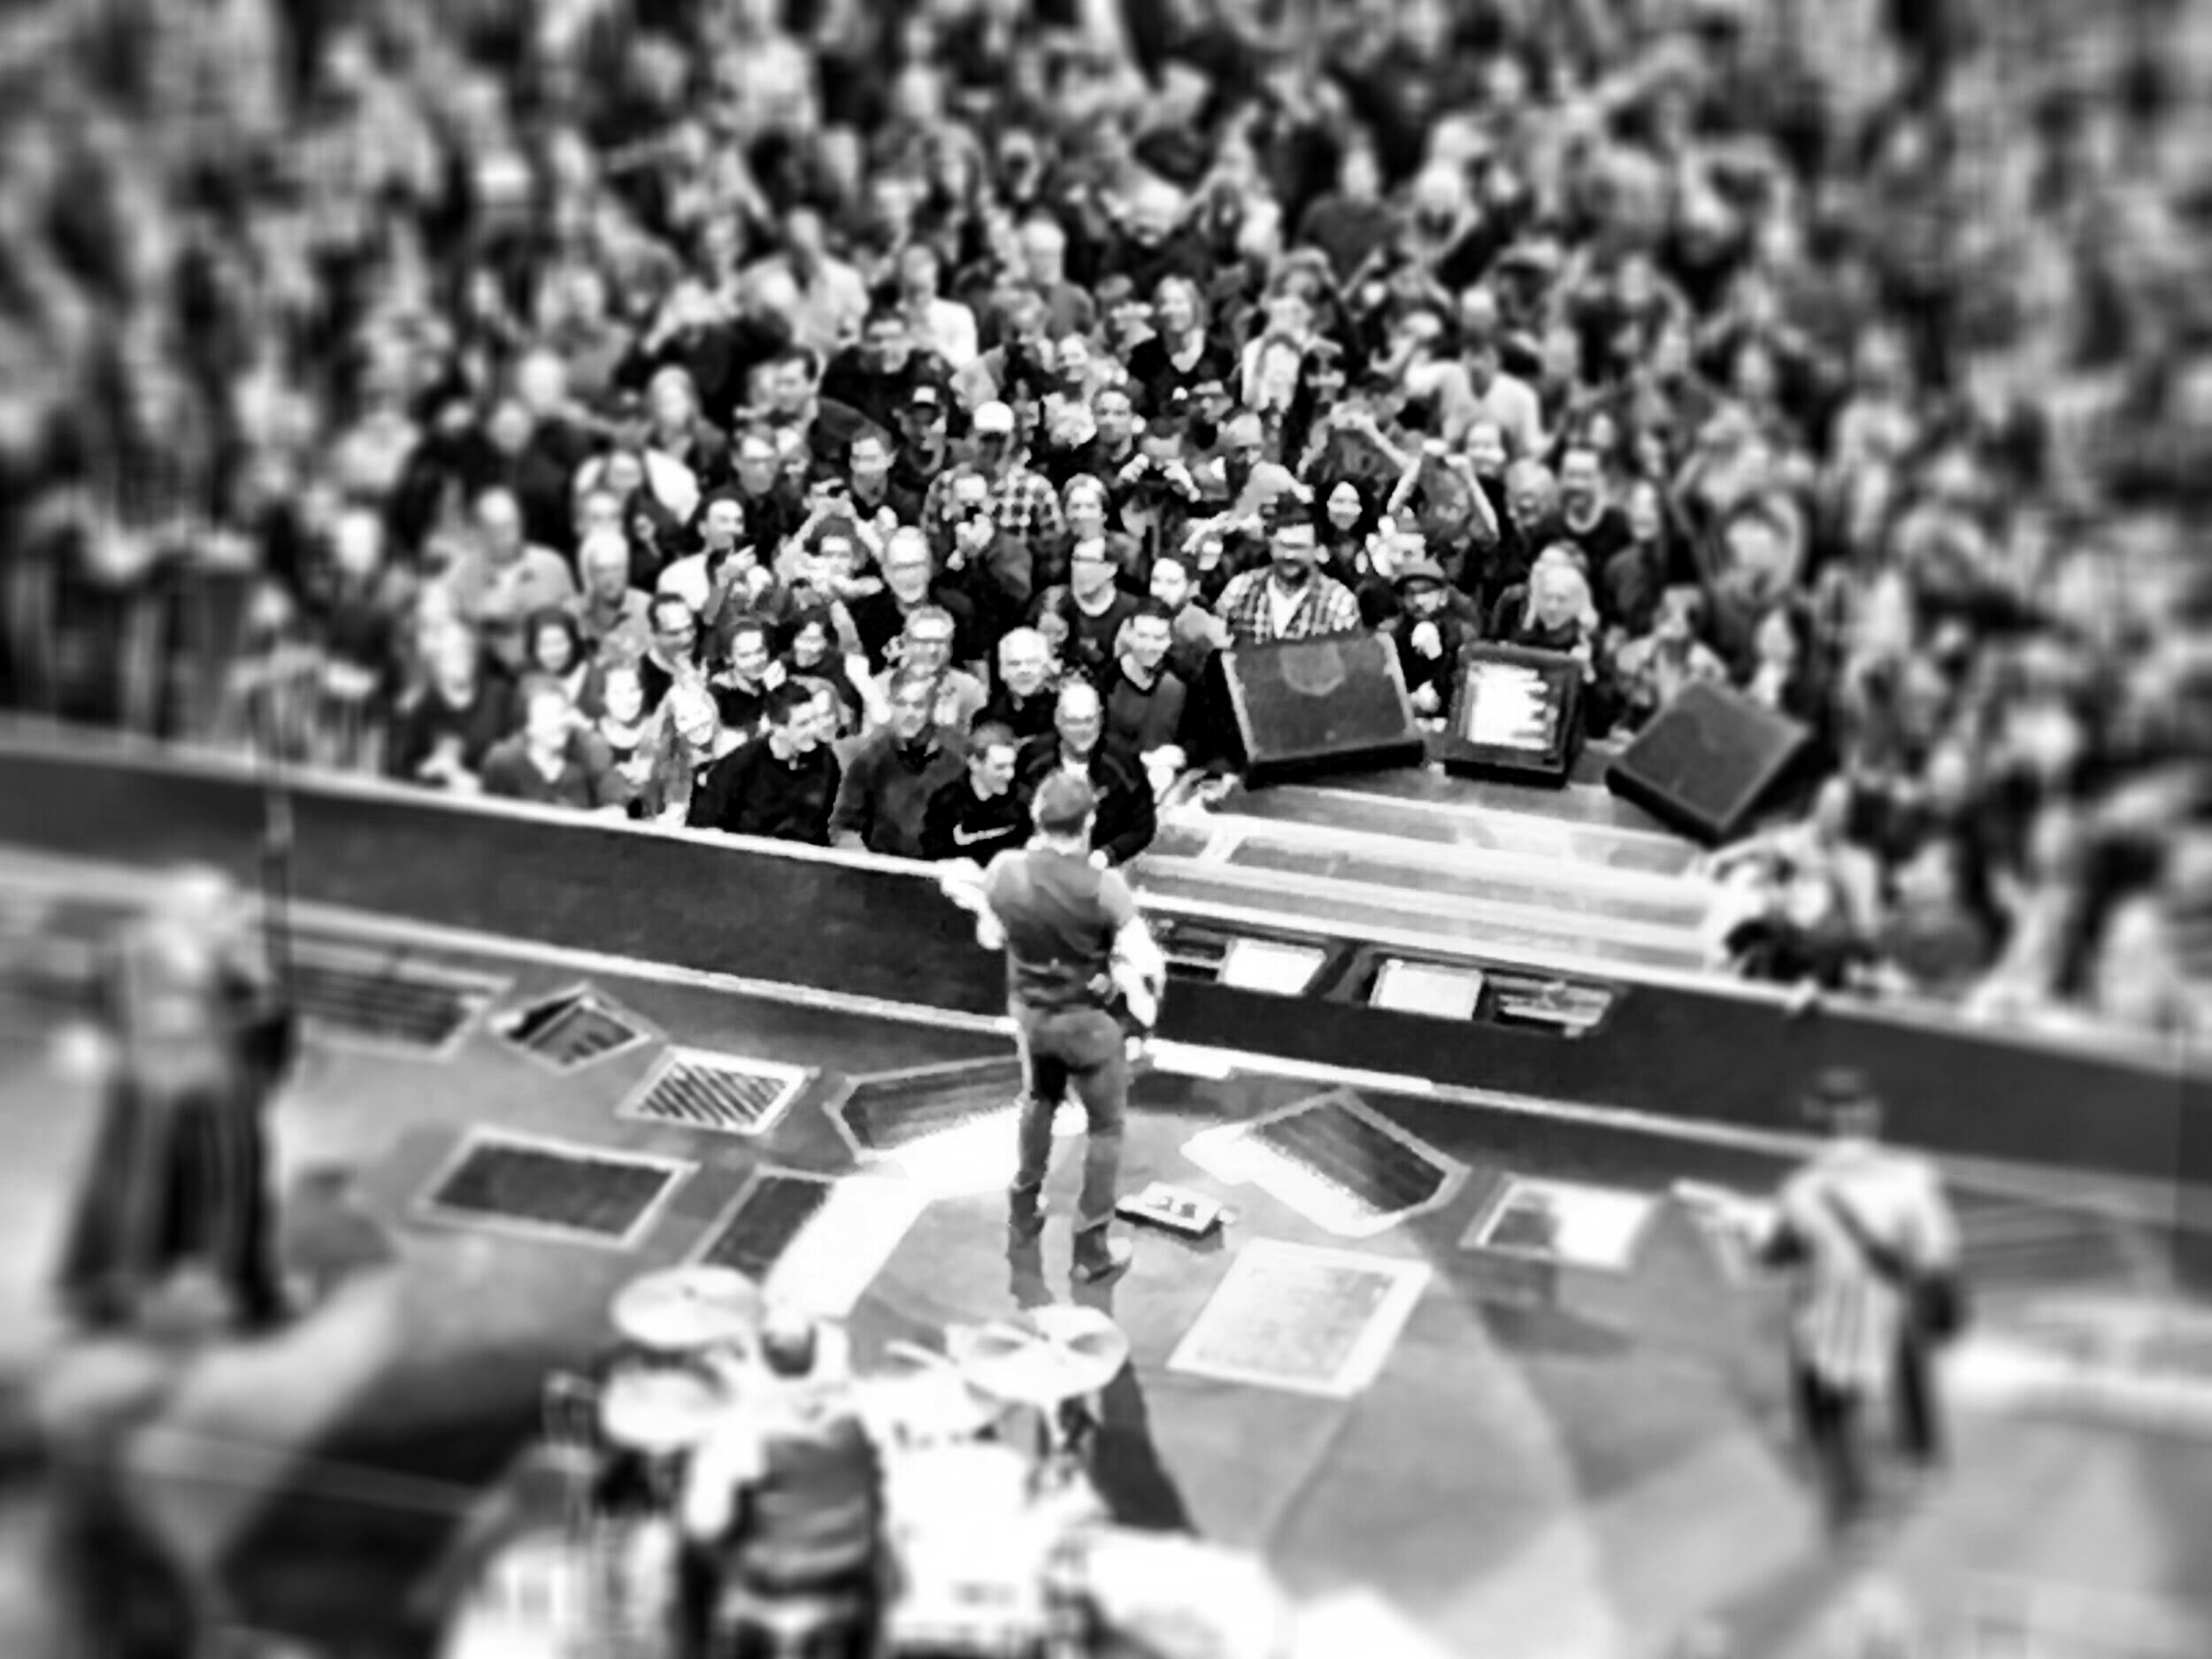 Bruce Springsteen in concert. (Photo by Scott P. Richert)